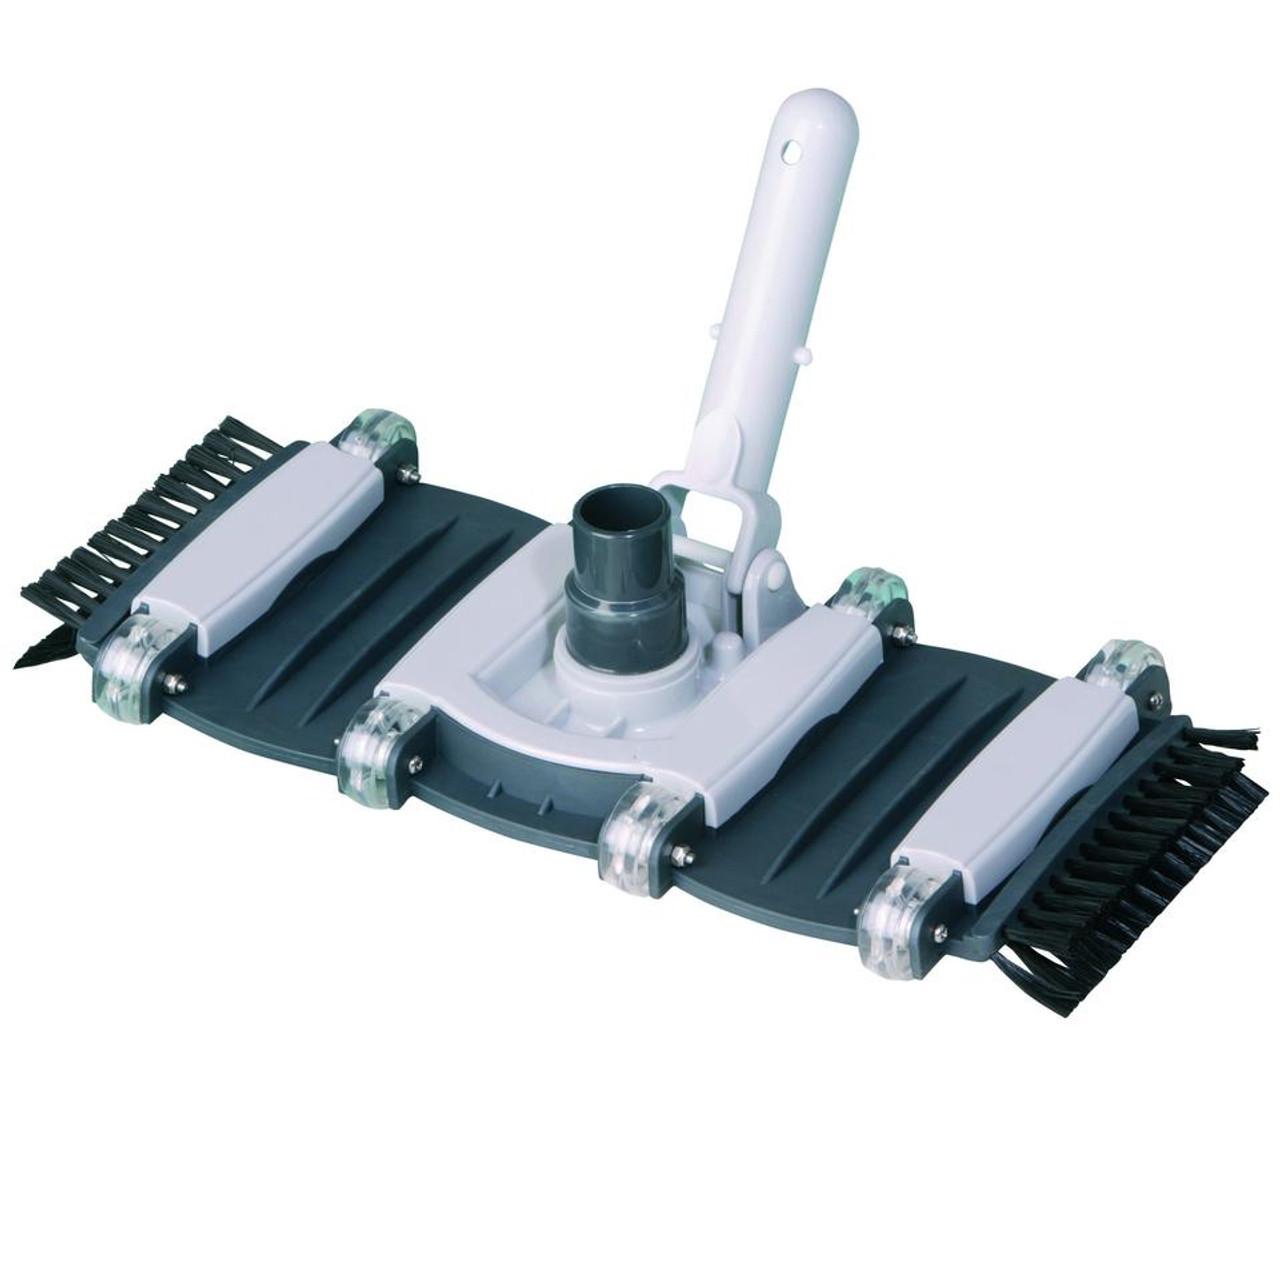 Certikin deluxe vacuum hoover head cleaning brush